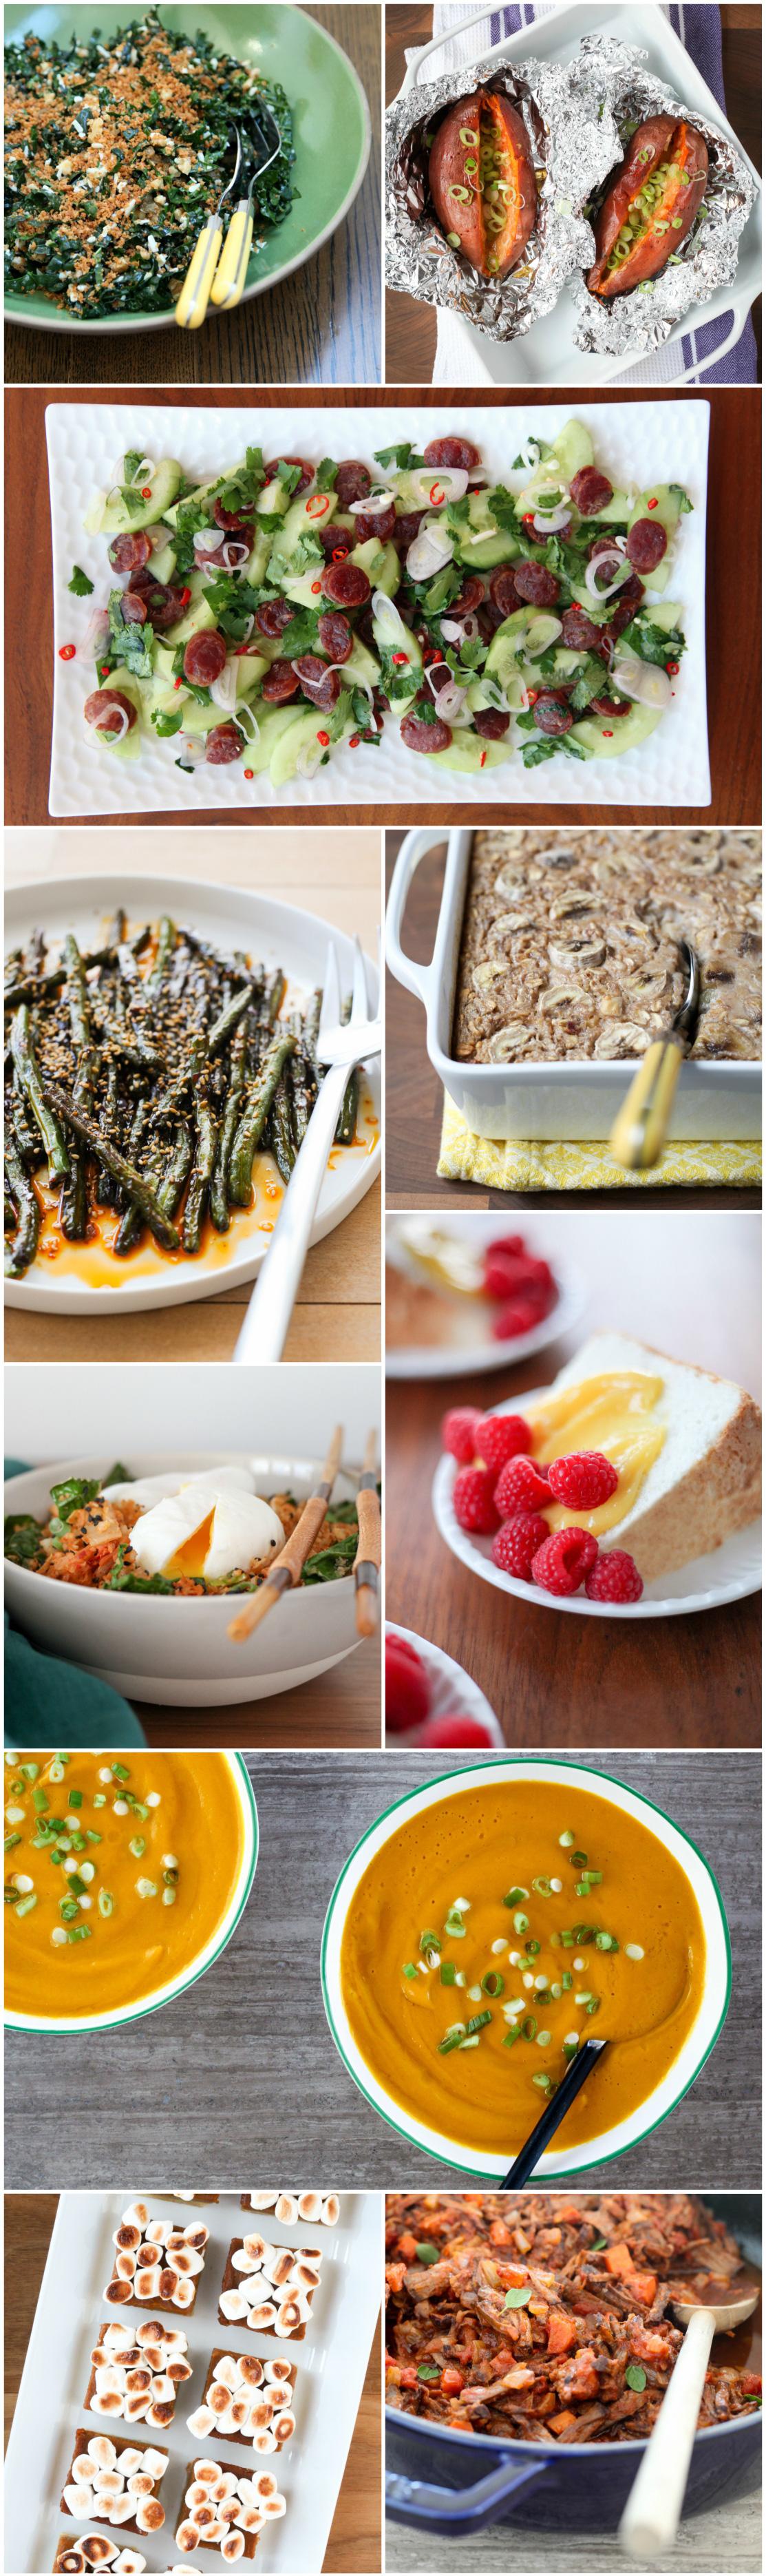 10 Favorite Recipes of 2016 | A Modest Feast | @amodestfeast